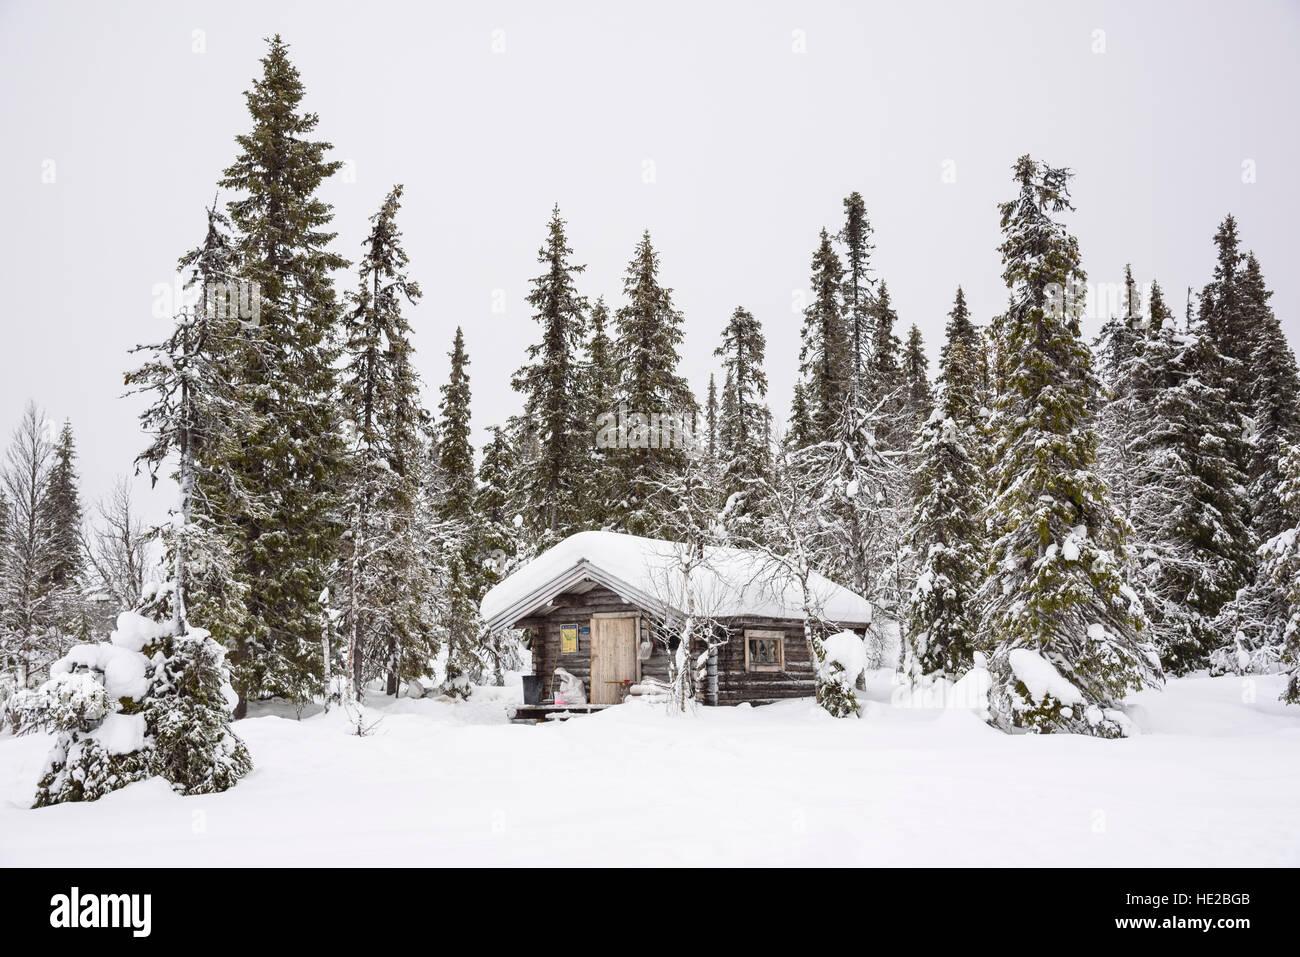 Typical wilderness log cabin in winter snow, Vindelfjällen, Sweden - Stock Image